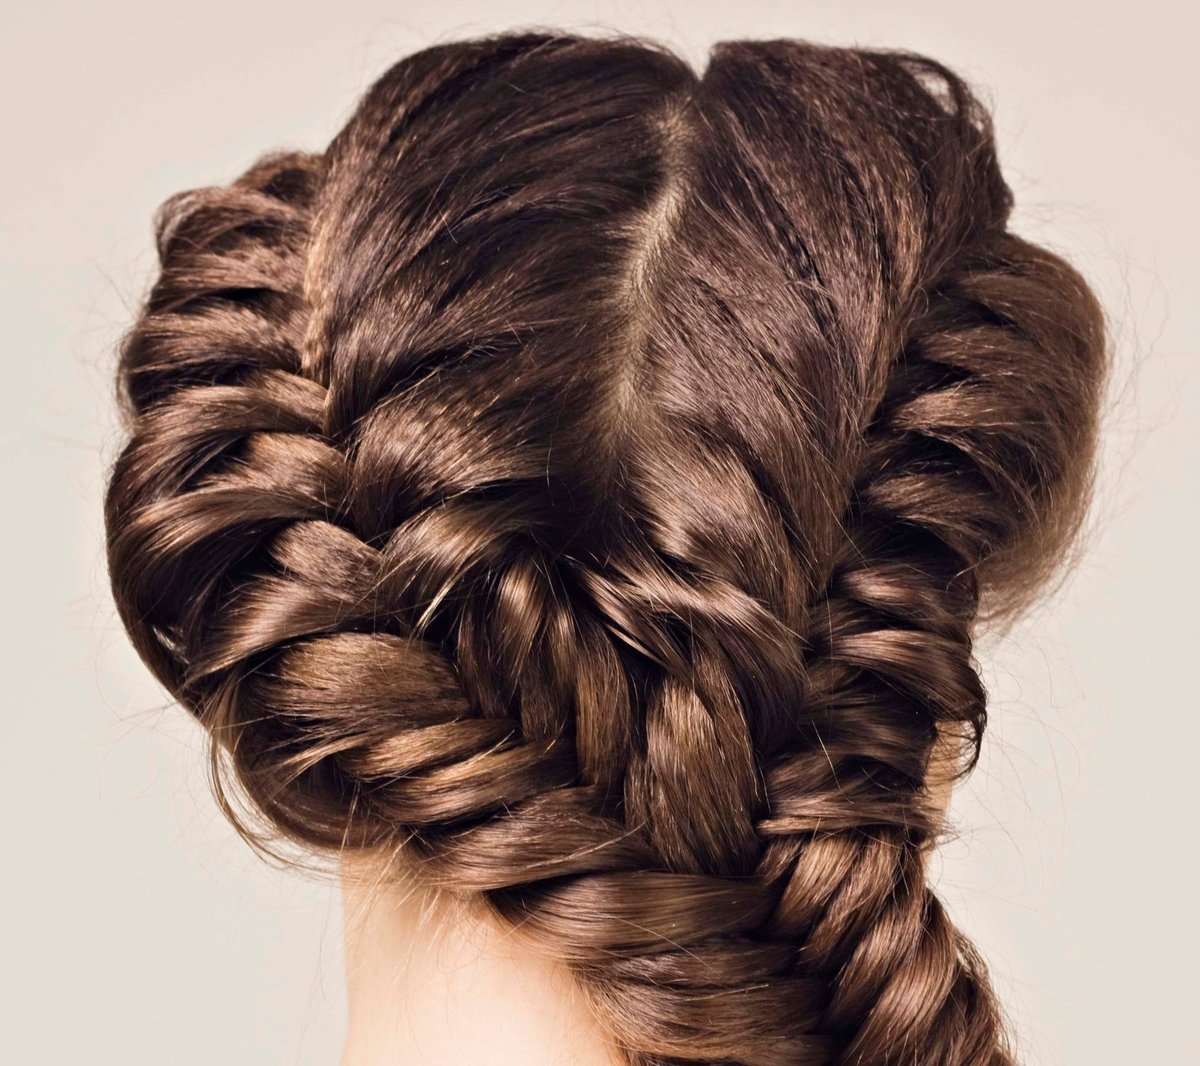 картинки косичек из волос предназначен для